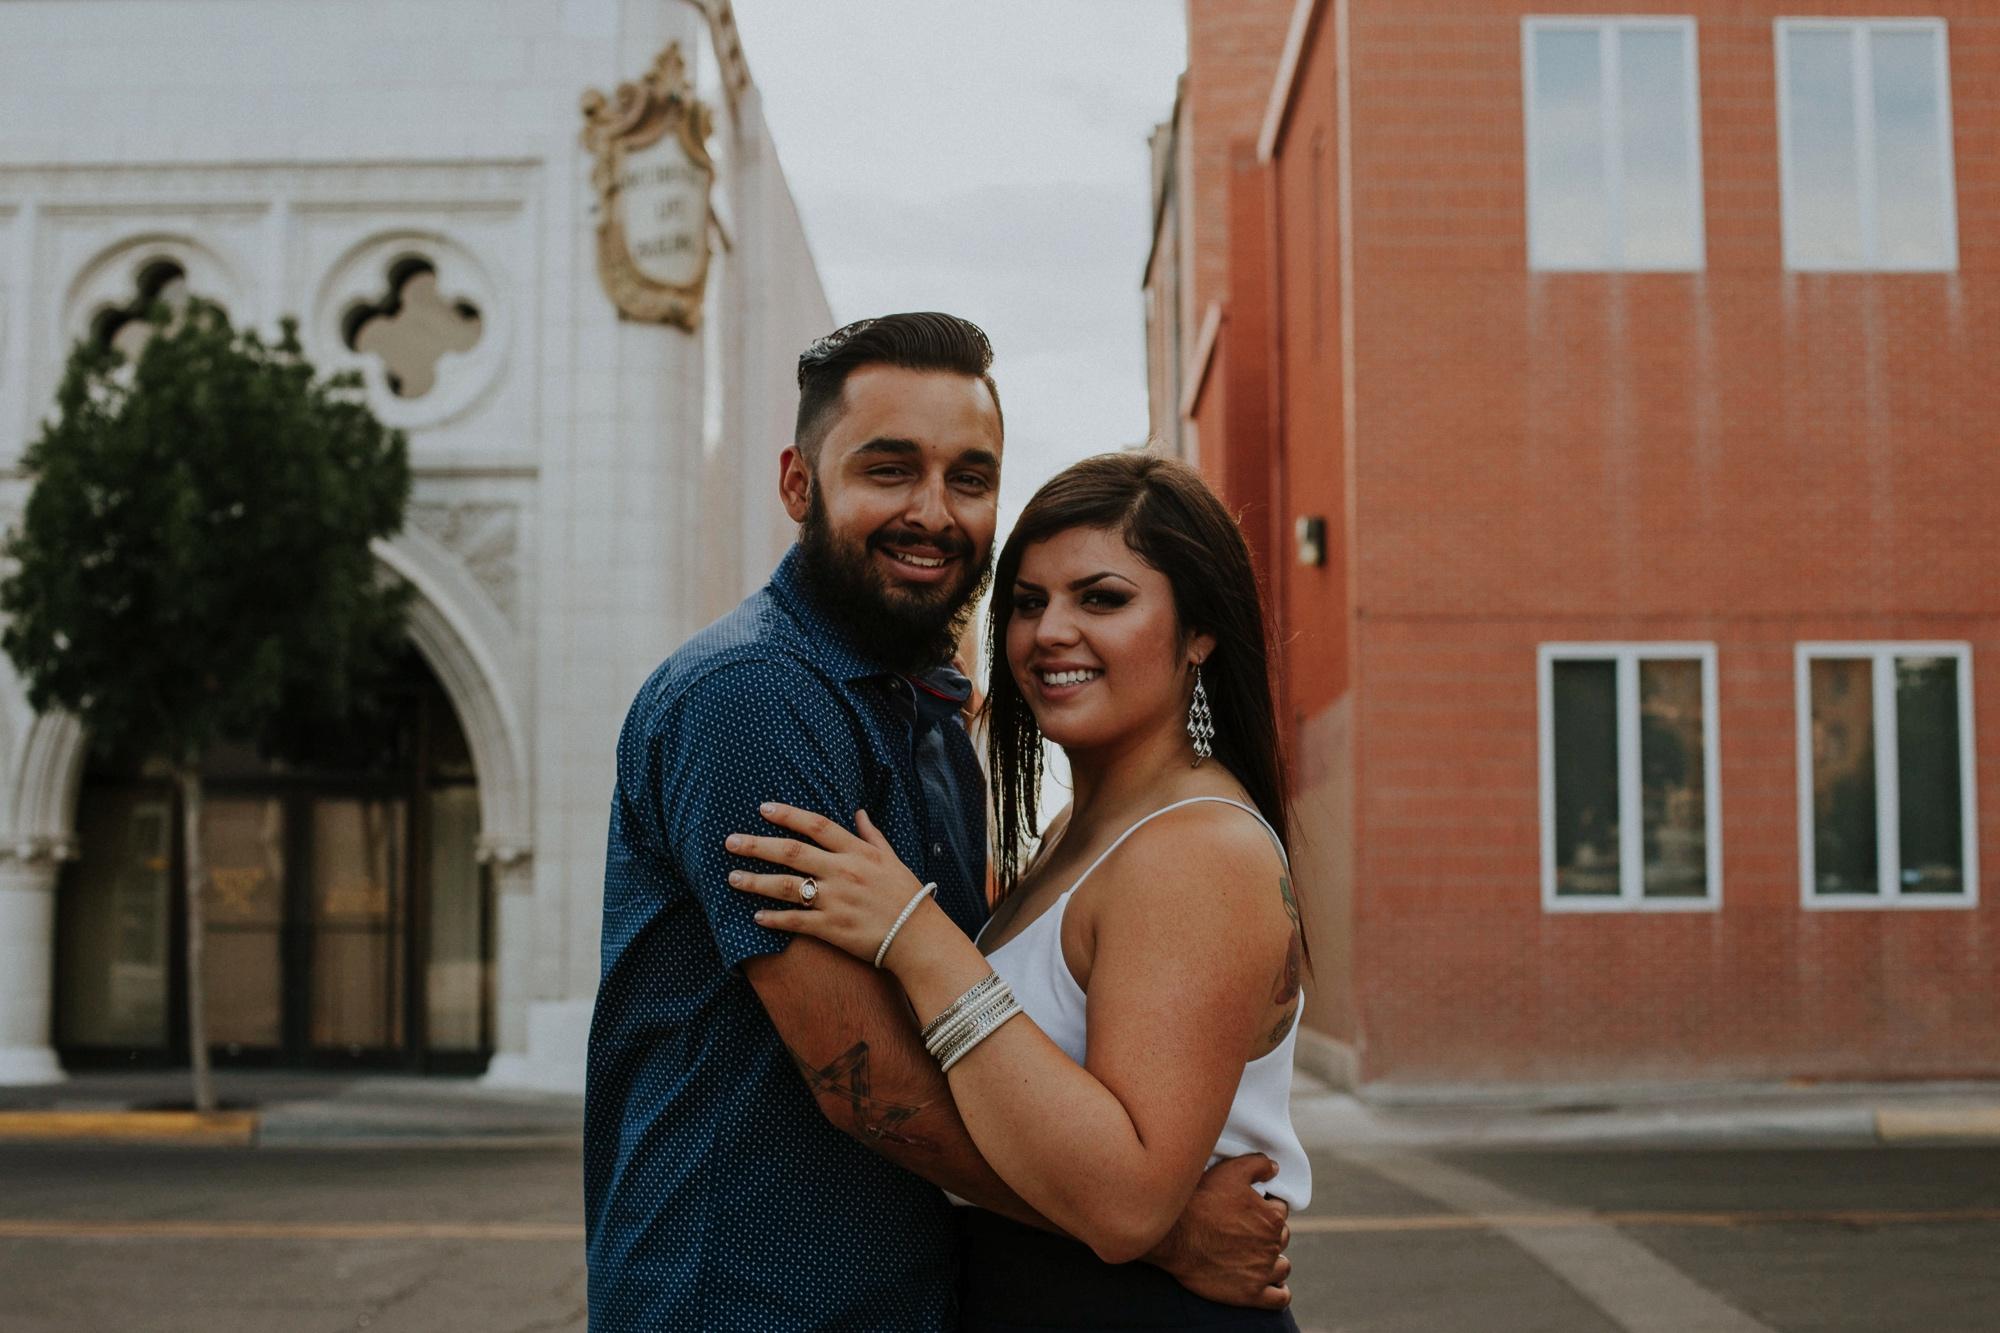 Alicia + Joshua   Jasper K Photography   Downtown Albuquerque Engagement   Albuquerque, New Mexico Engagement Photographer